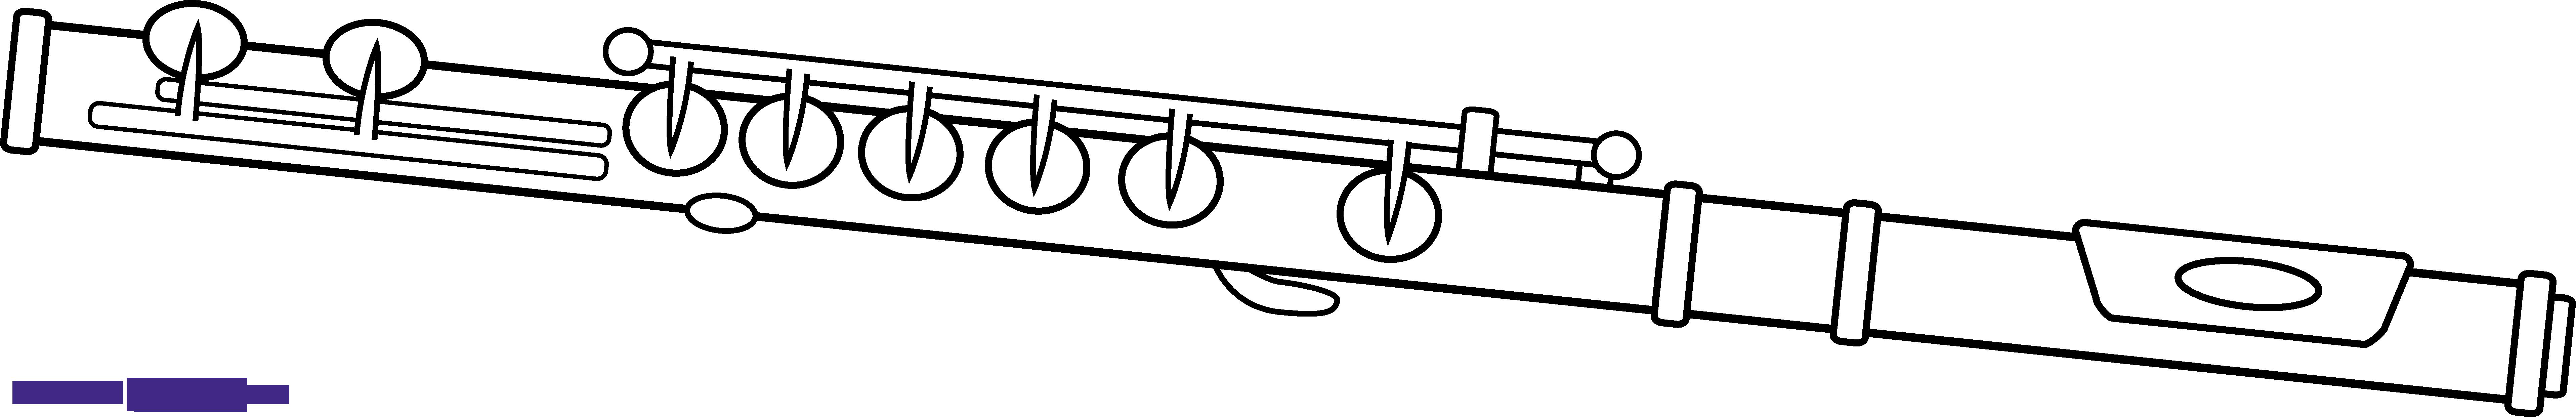 Flute clipart. Line art sweet clip